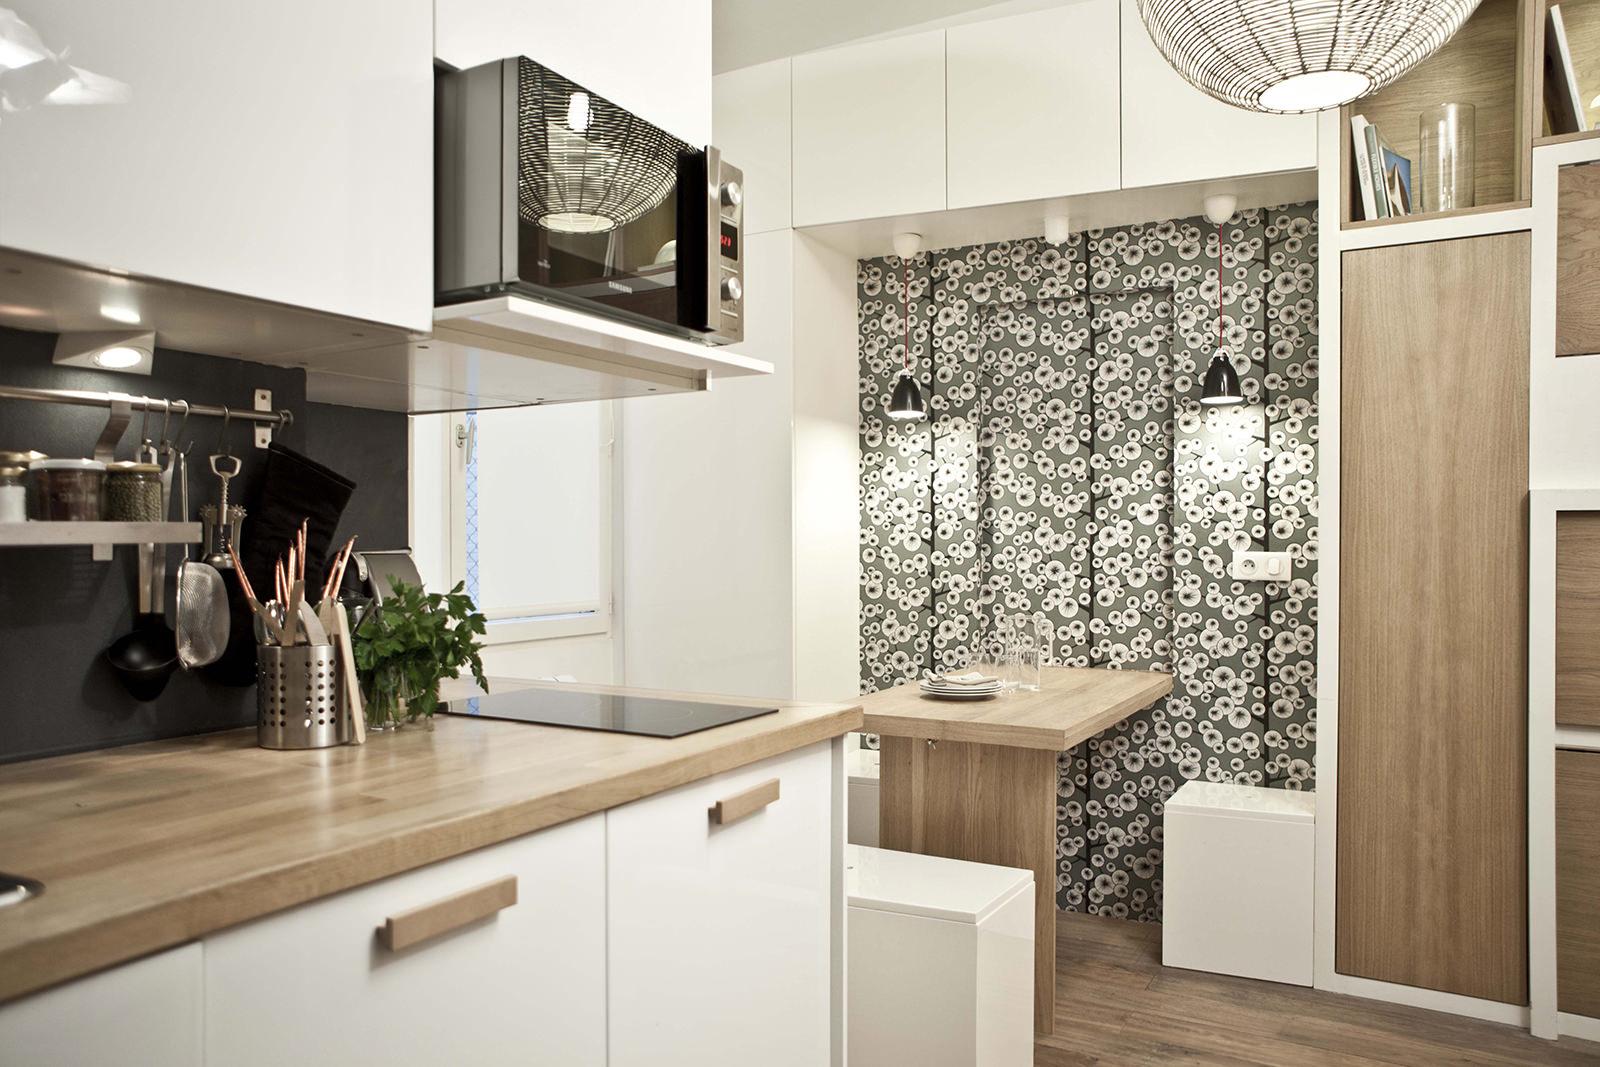 кухня-студия дизайн фото 18 кв.м